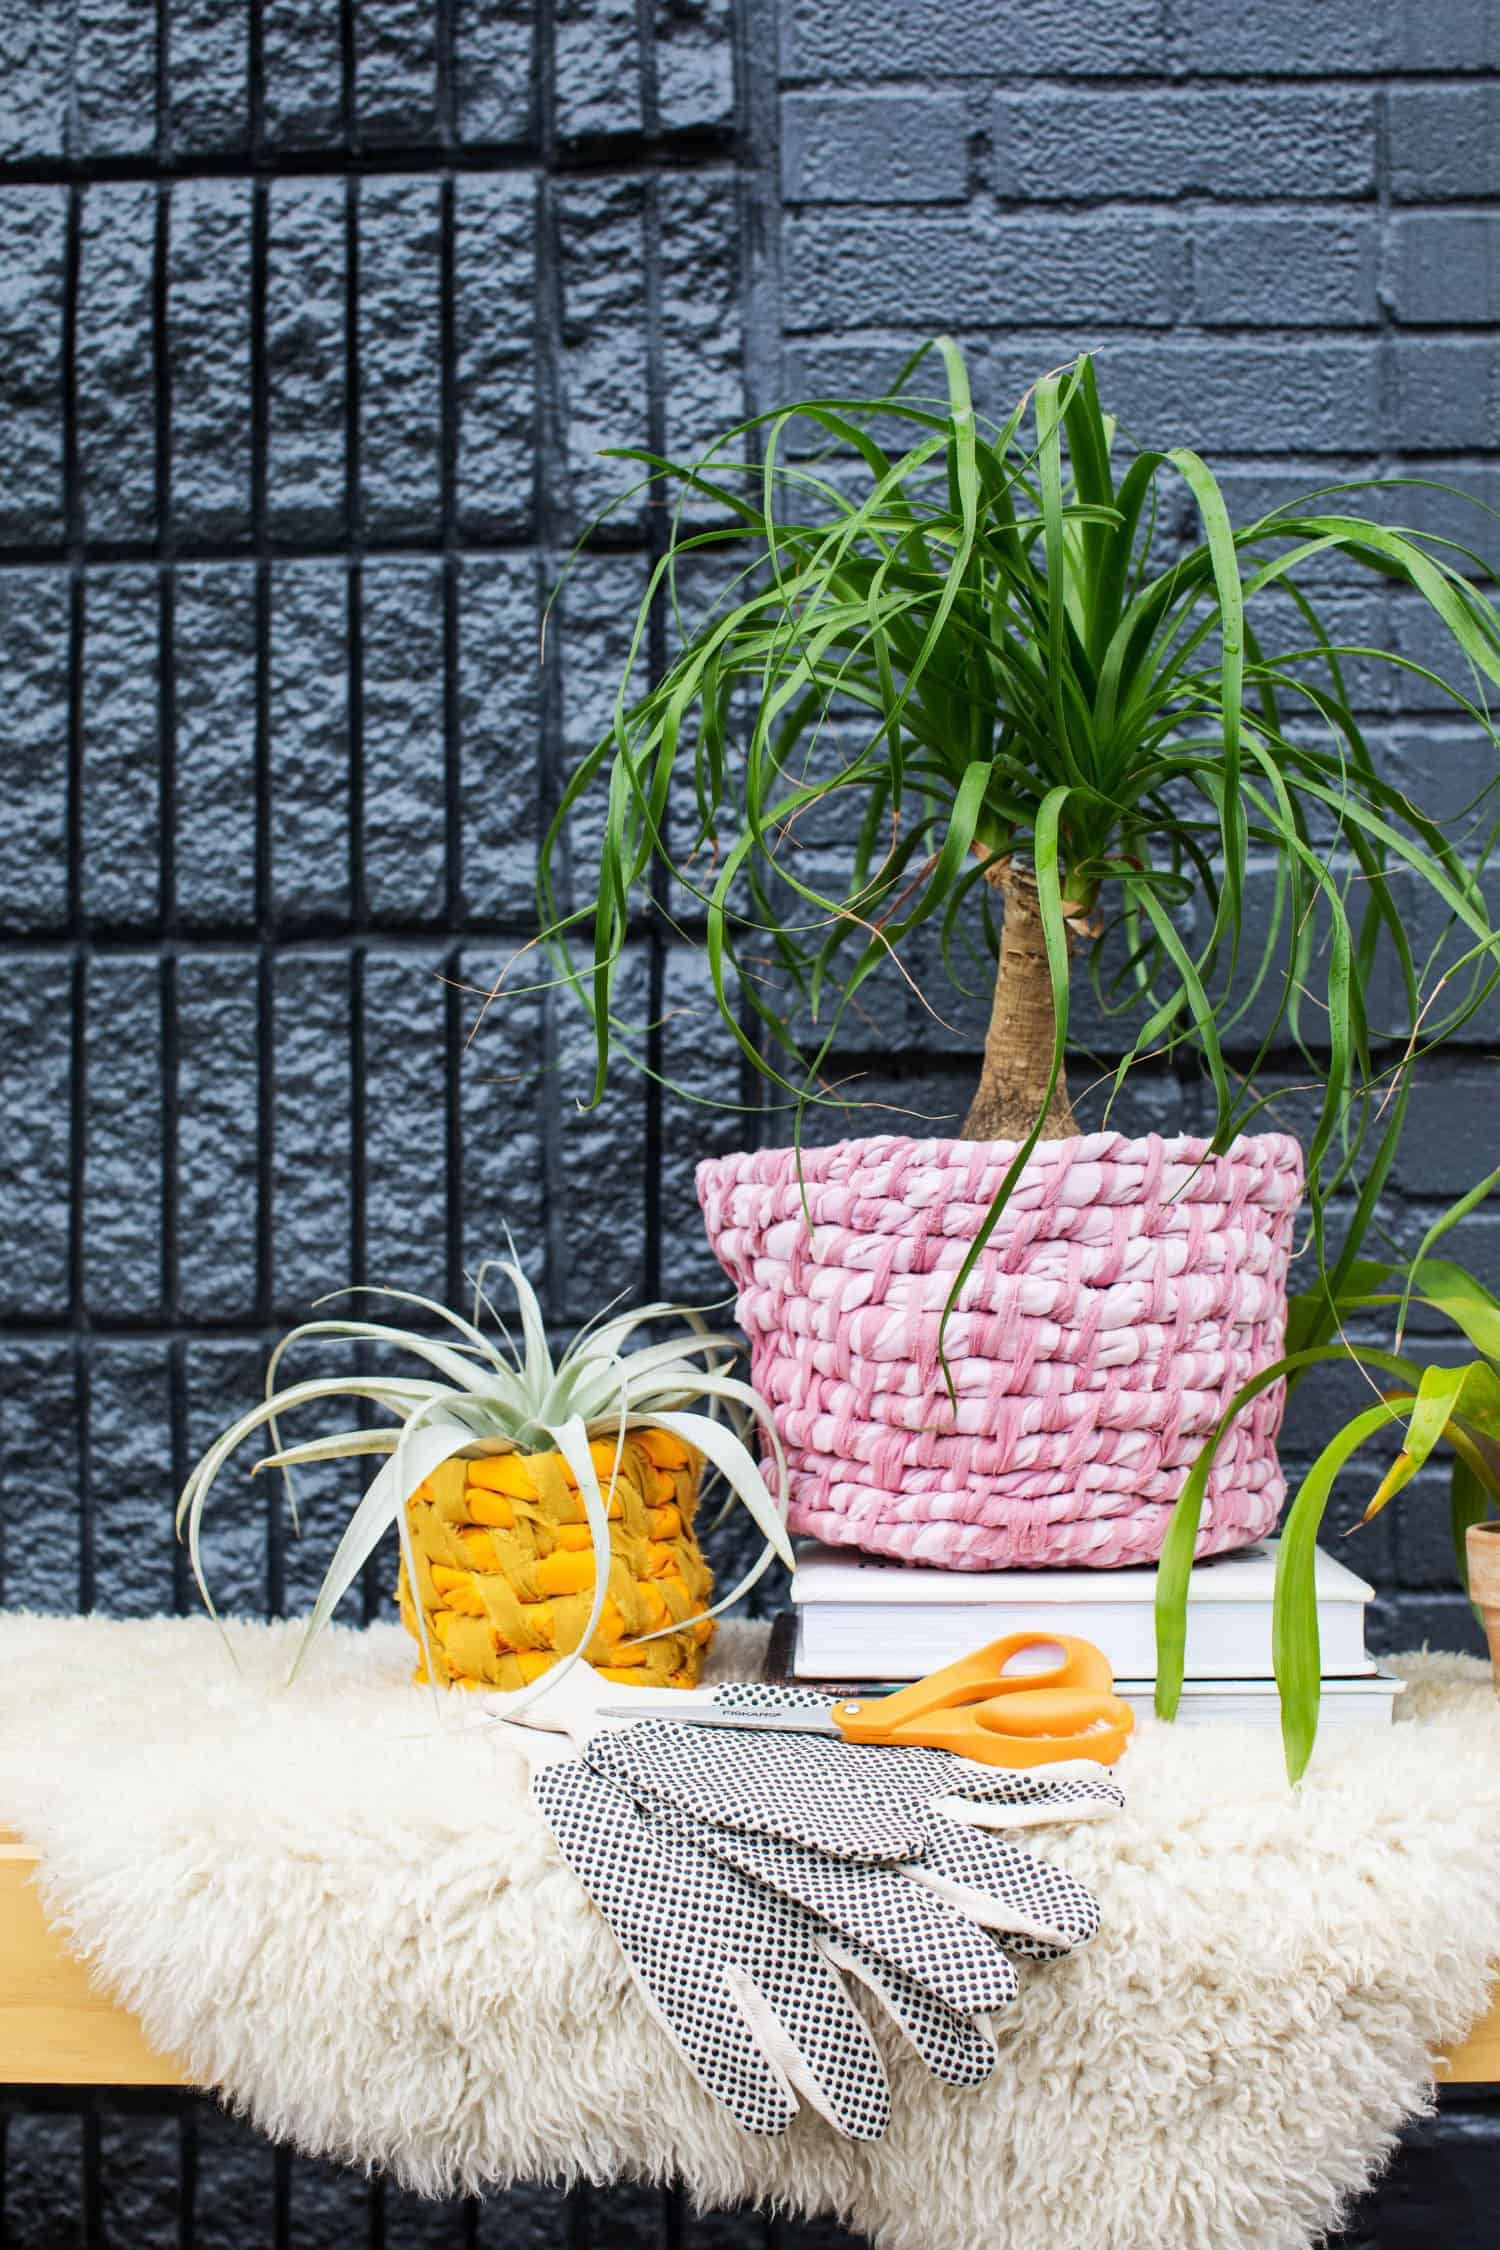 3 Easy Diy Storage Ideas For Small Kitchen: Easy Fabric Planter DIY